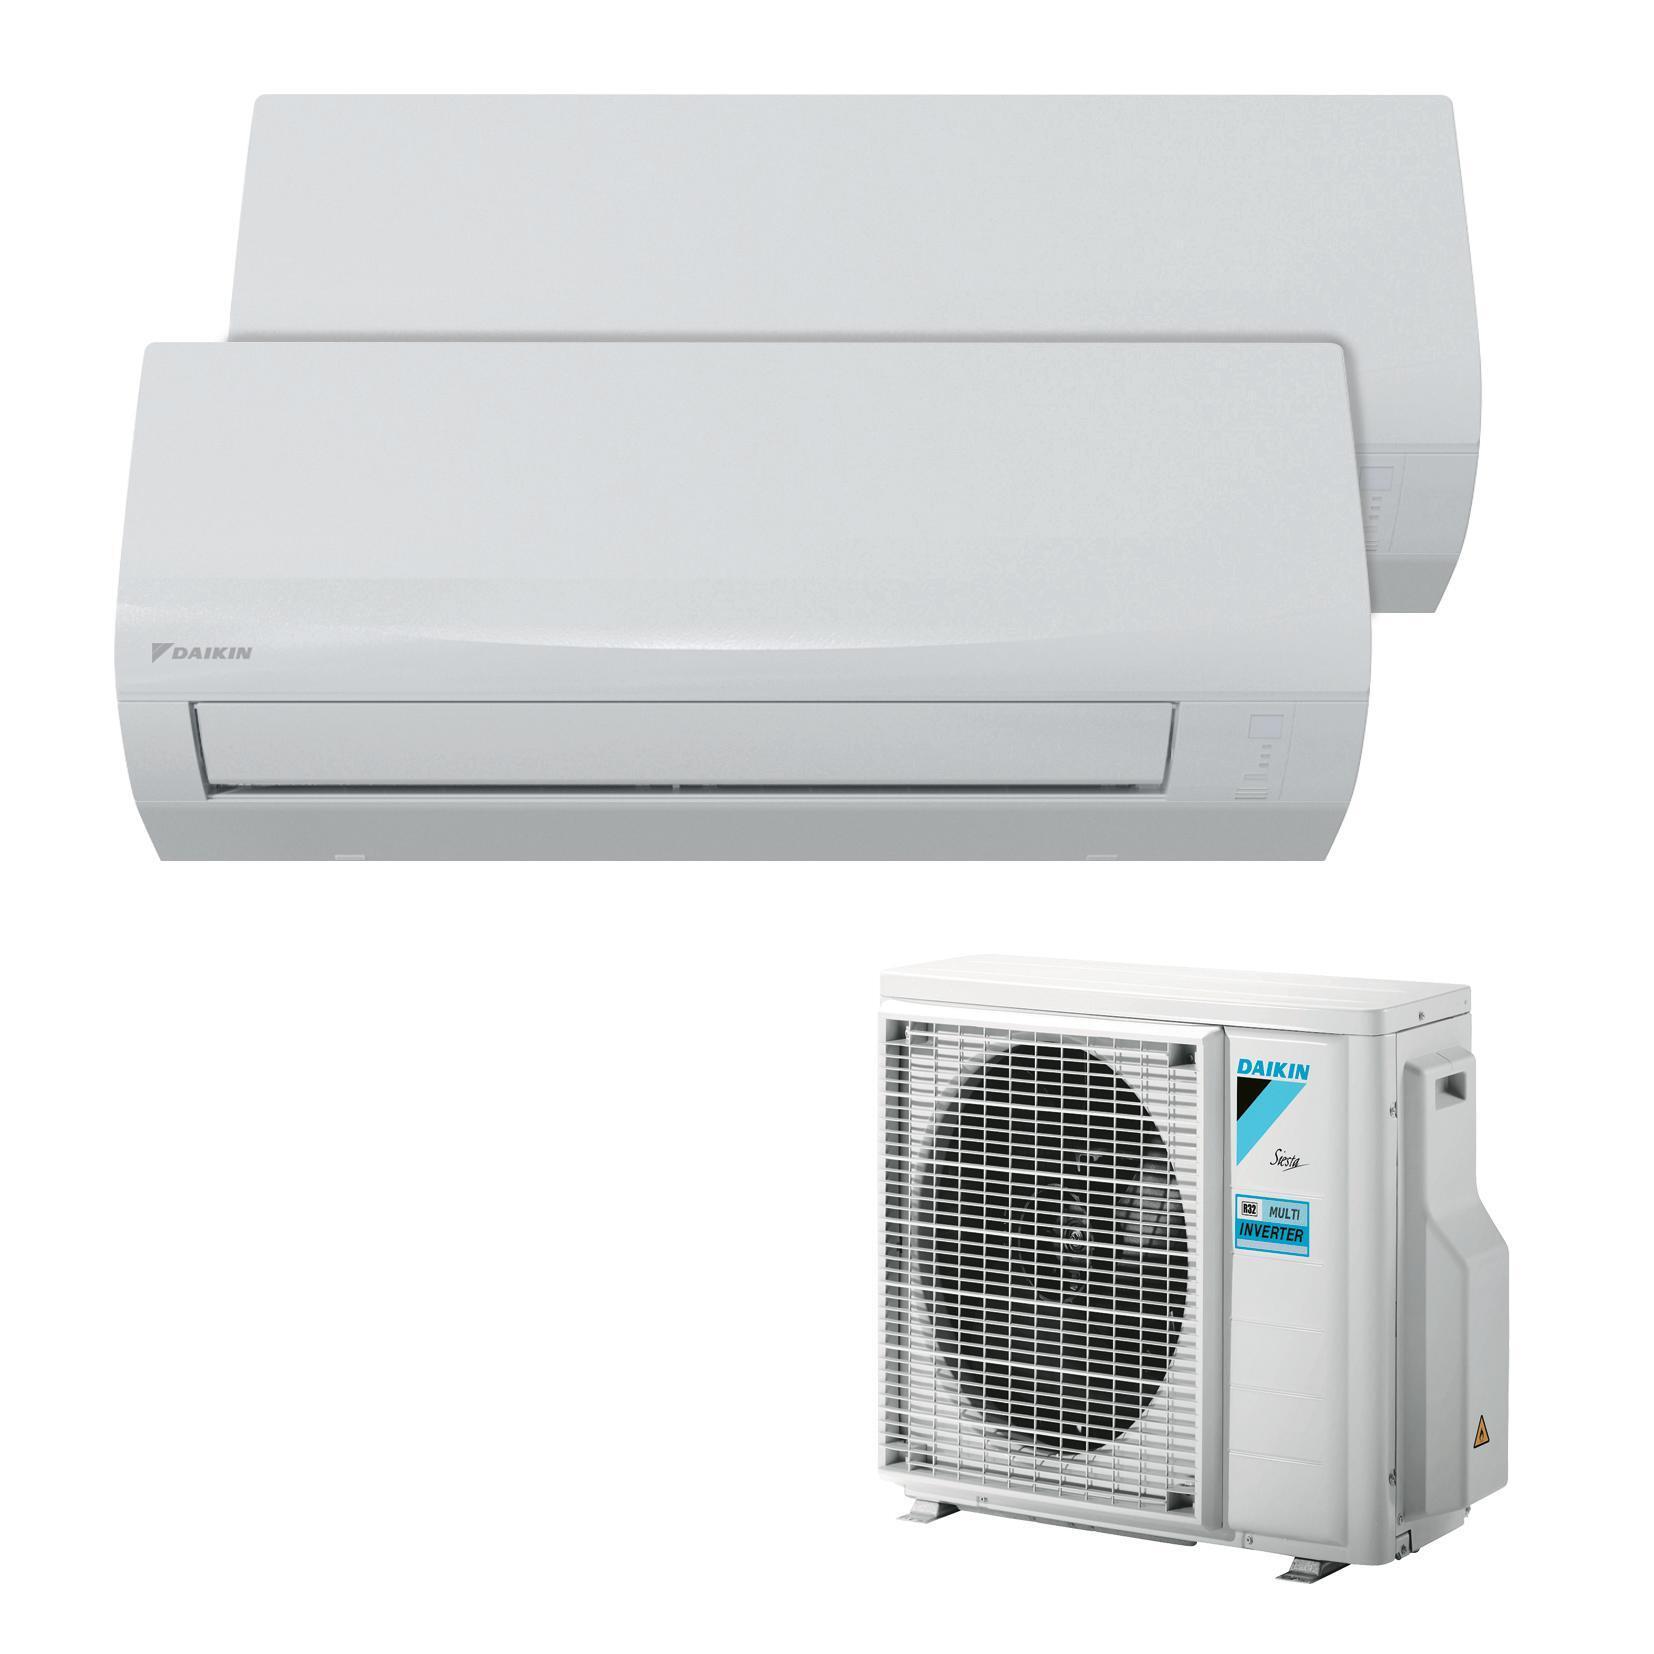 Climatizzatore dualsplit DAIKIN ATXF 17060 BTU - 1